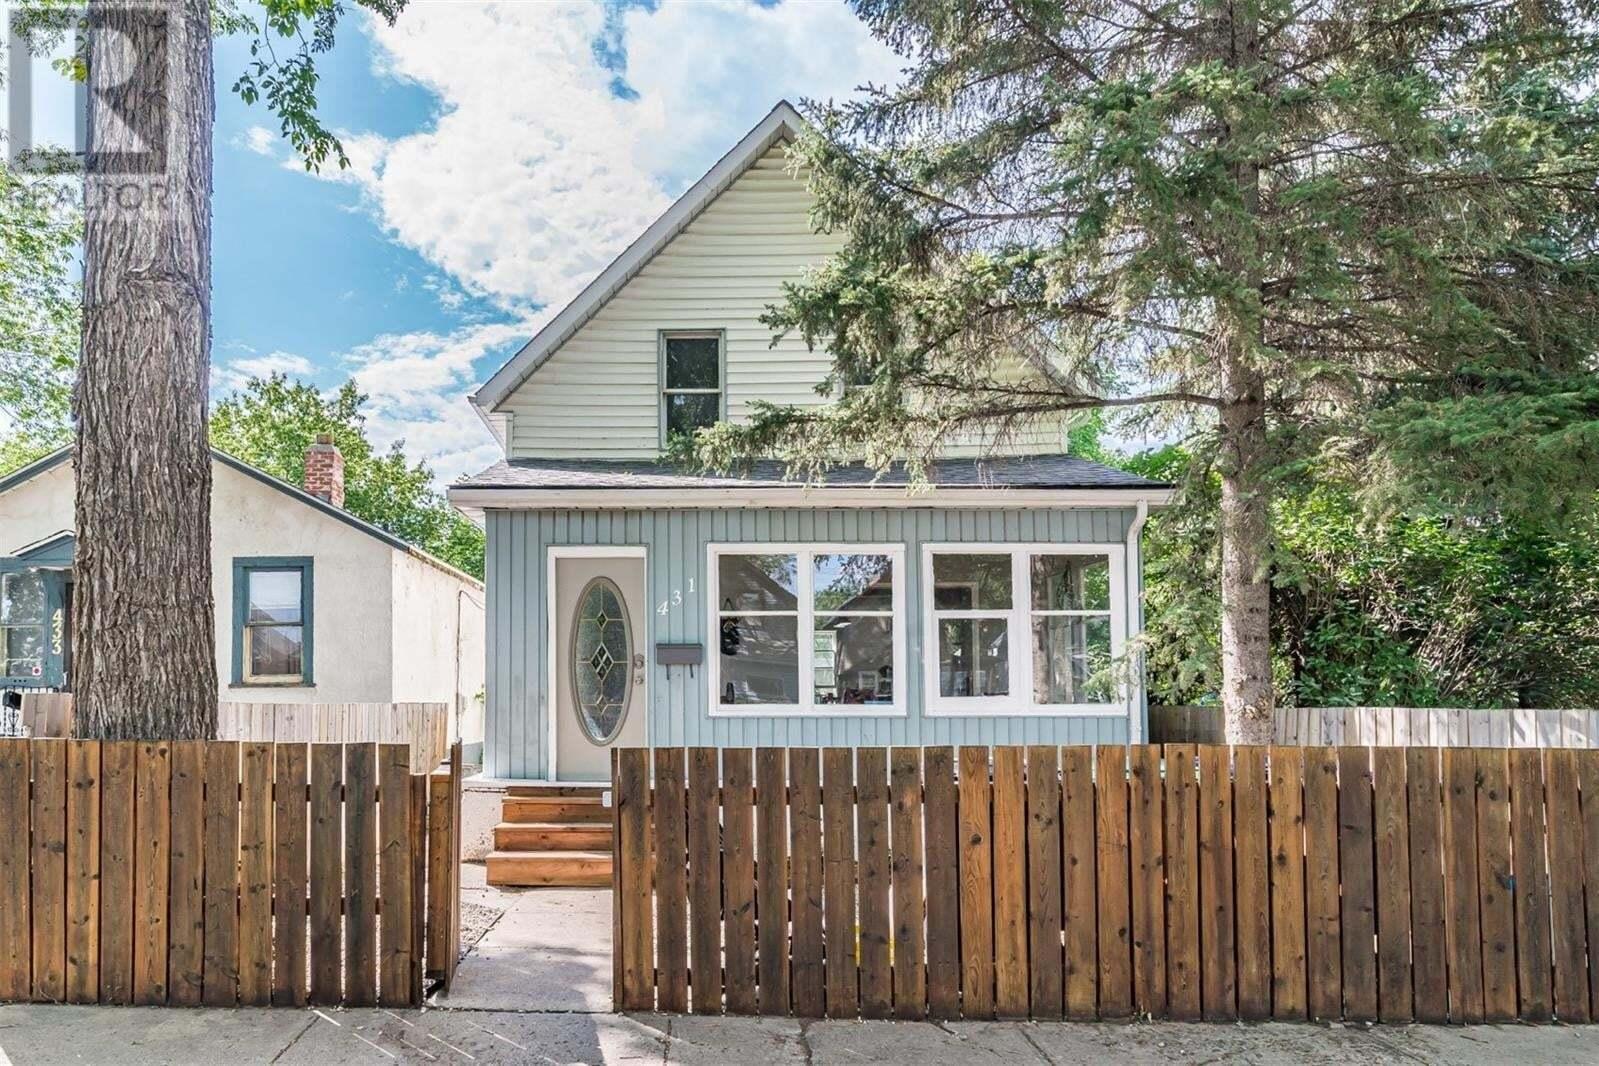 House for sale at 431 I Ave S Saskatoon Saskatchewan - MLS: SK819266